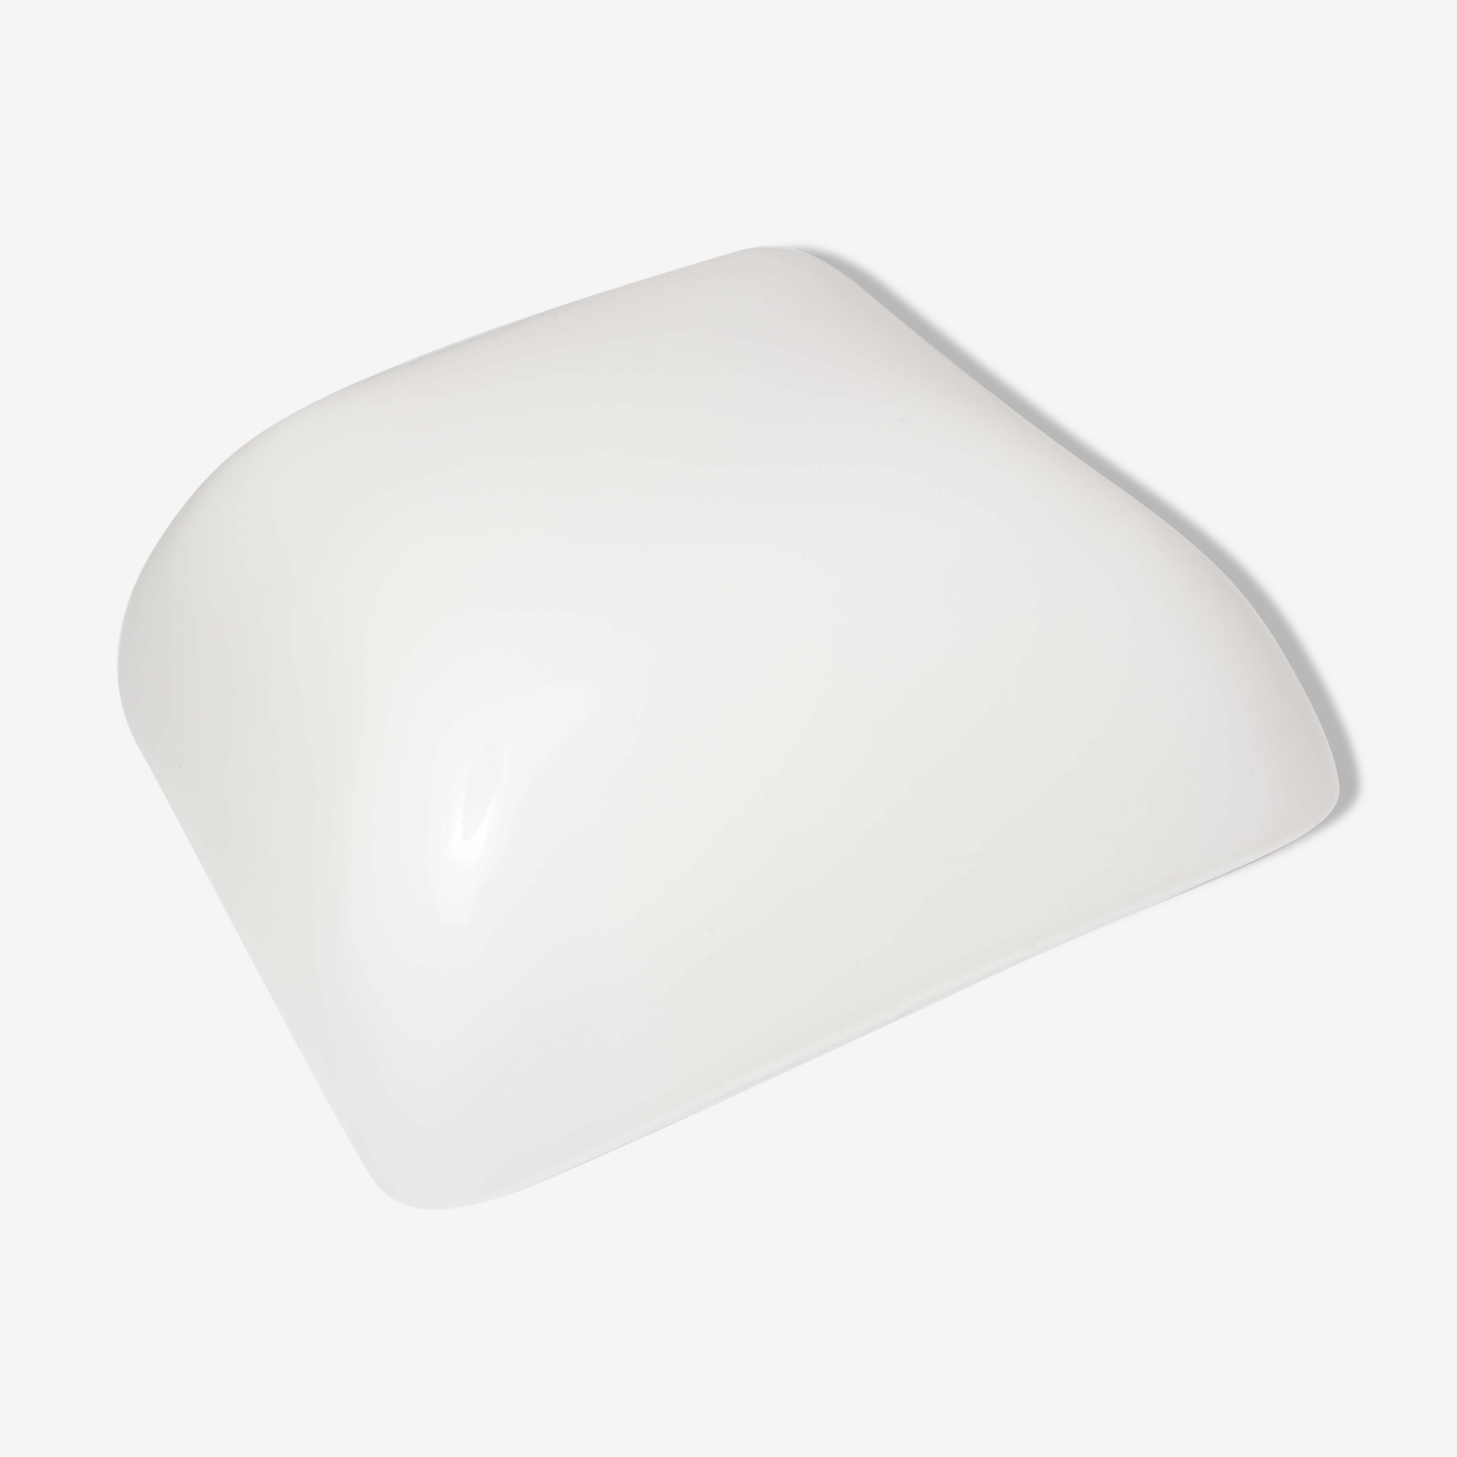 Plafonnier opaline blanche, 60s